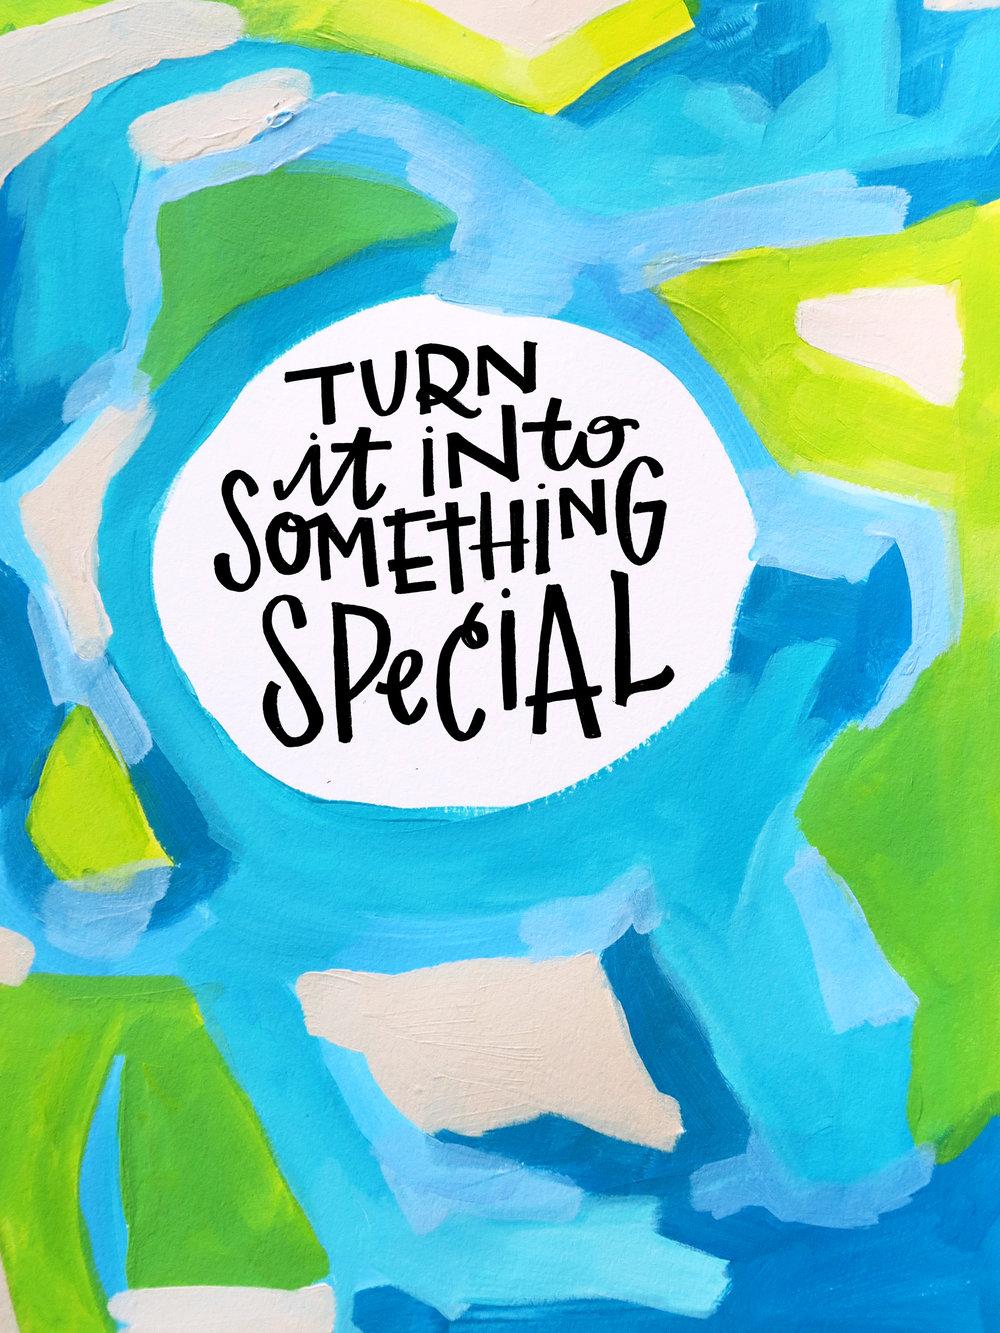 7/3/16: Special